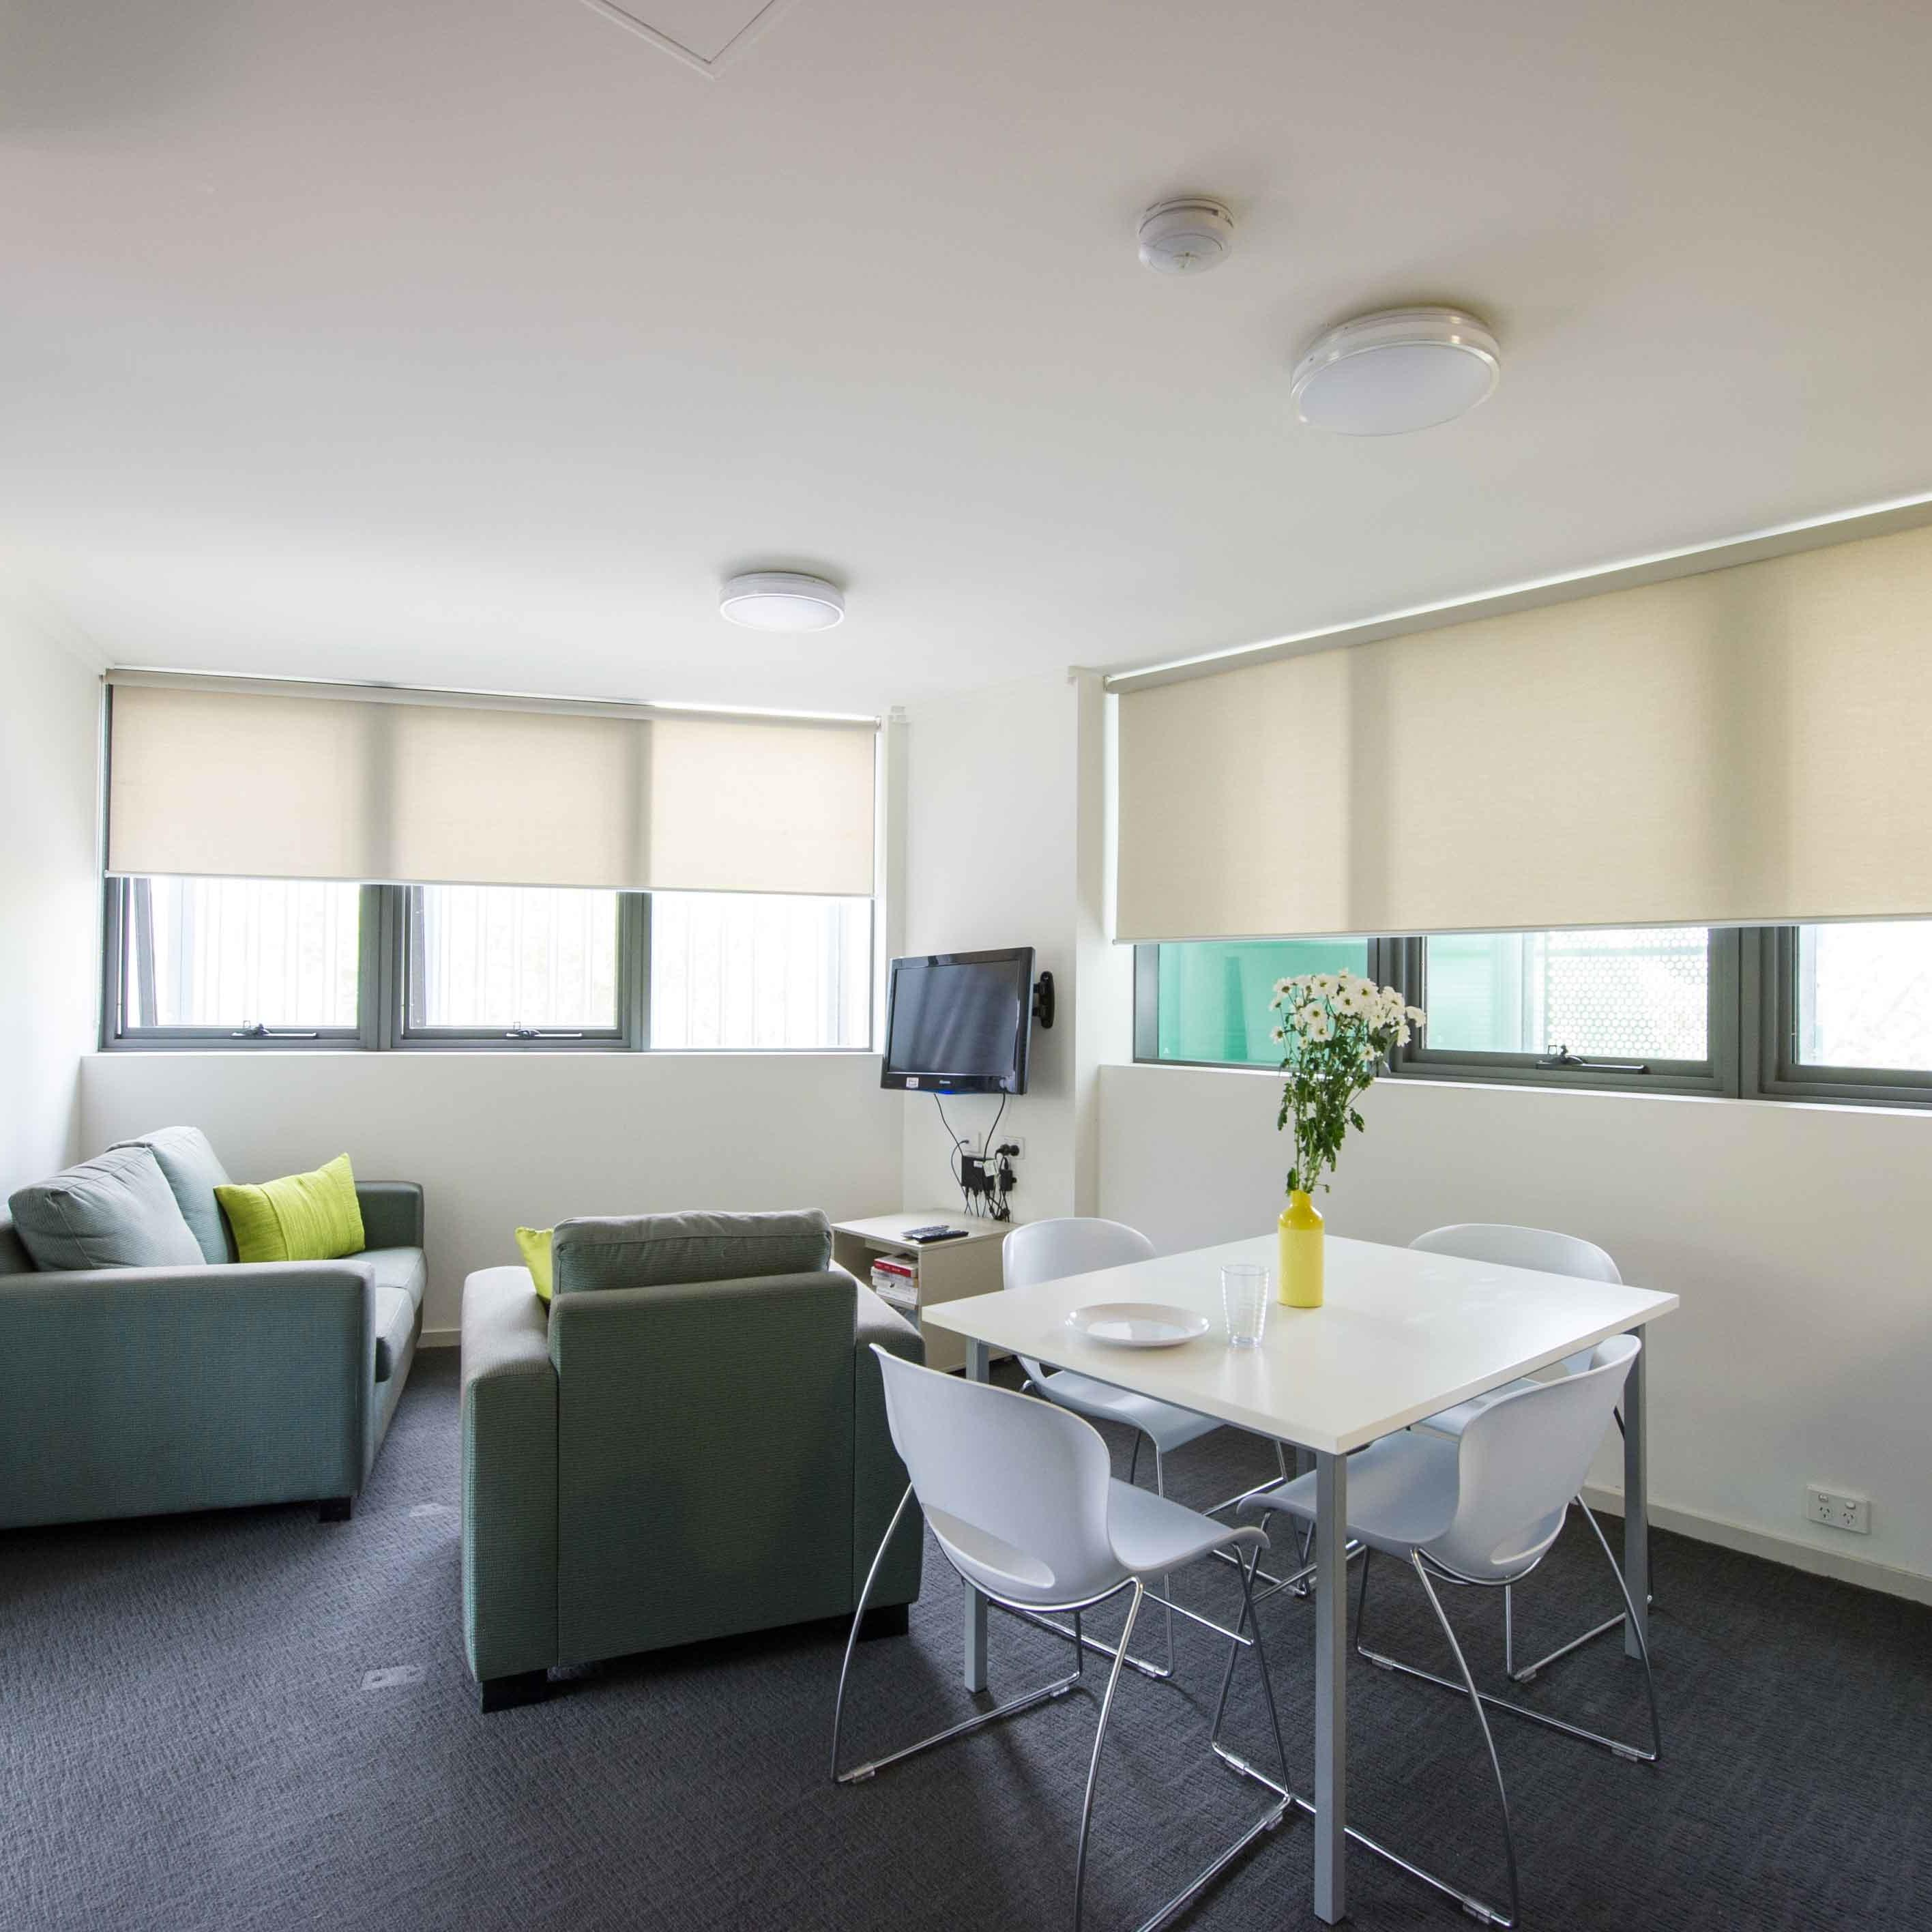 UniLodge @ ANU Warrambul Lodge 2 Bedroom Apartment